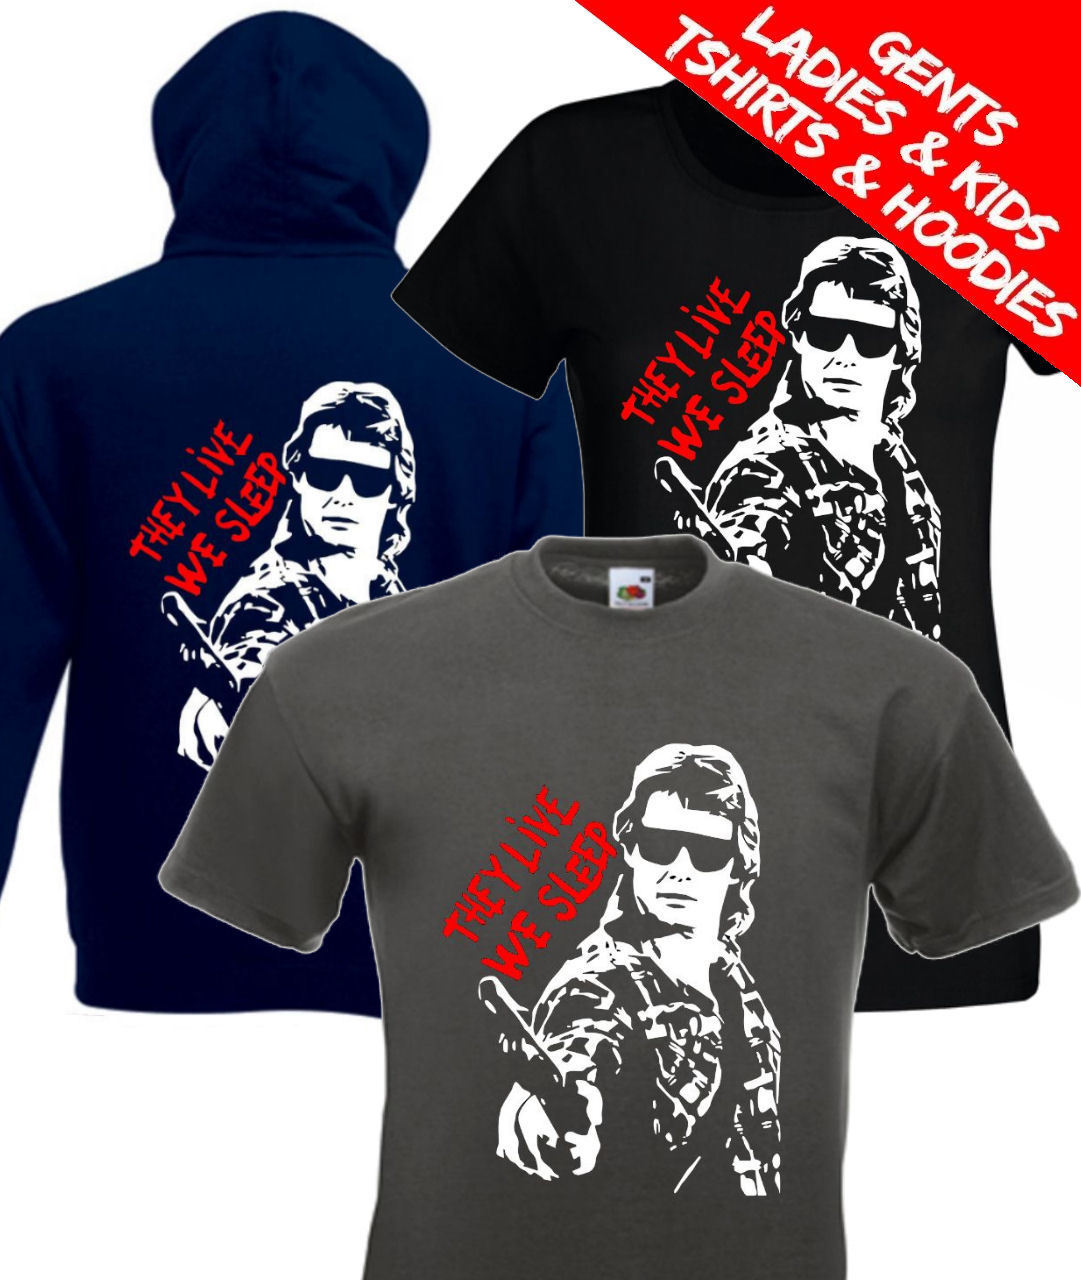 2019 Cool They Live Roddy Piper Retro John Carpenter Movie T Shirt / Hoodie Tee Hoodie